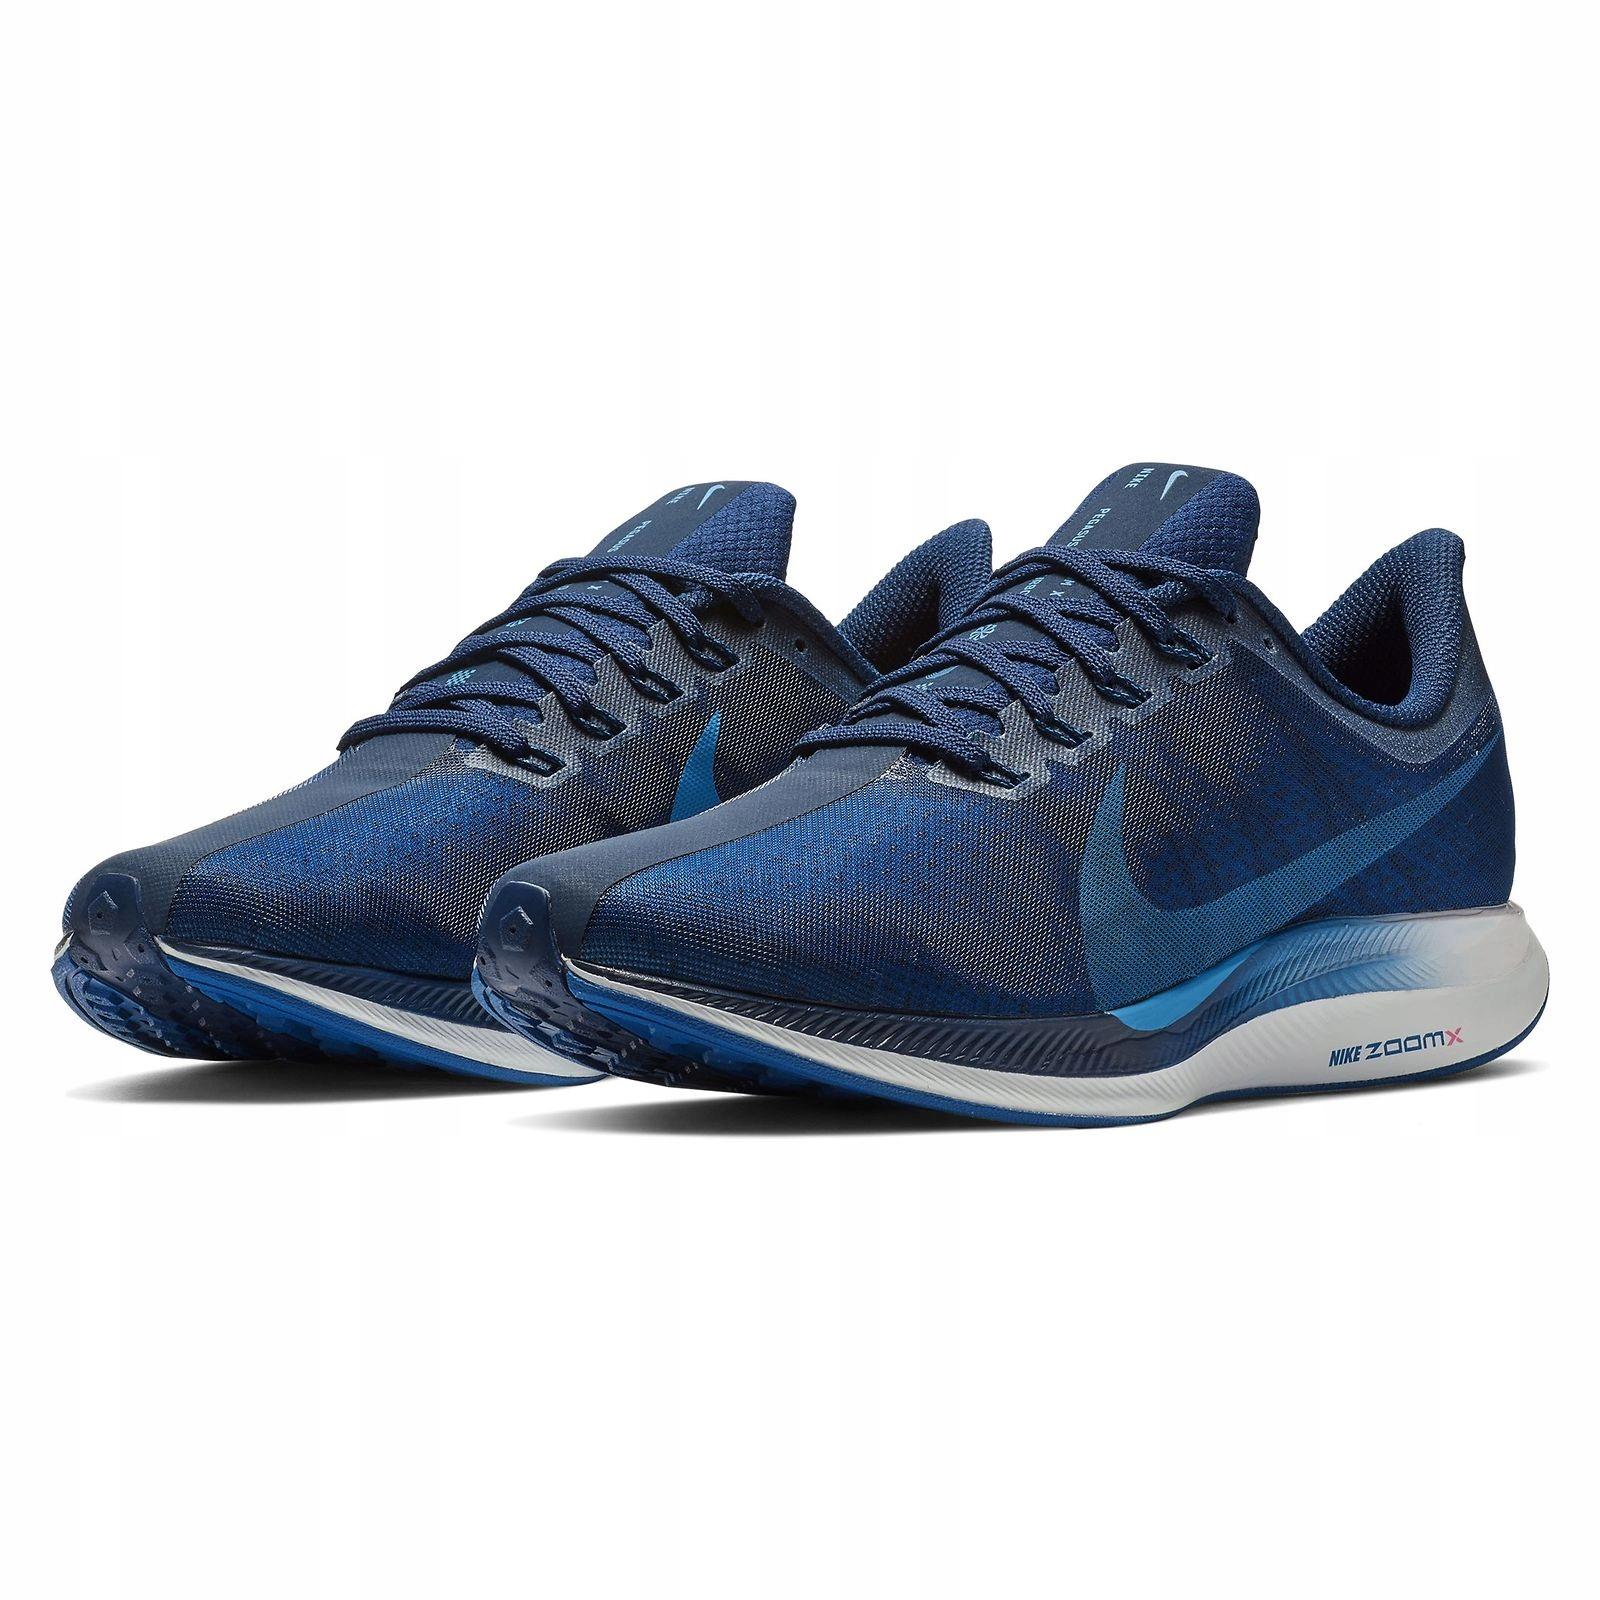 Buty Nike Pegasus 35 Turbo ALO W AJ4115